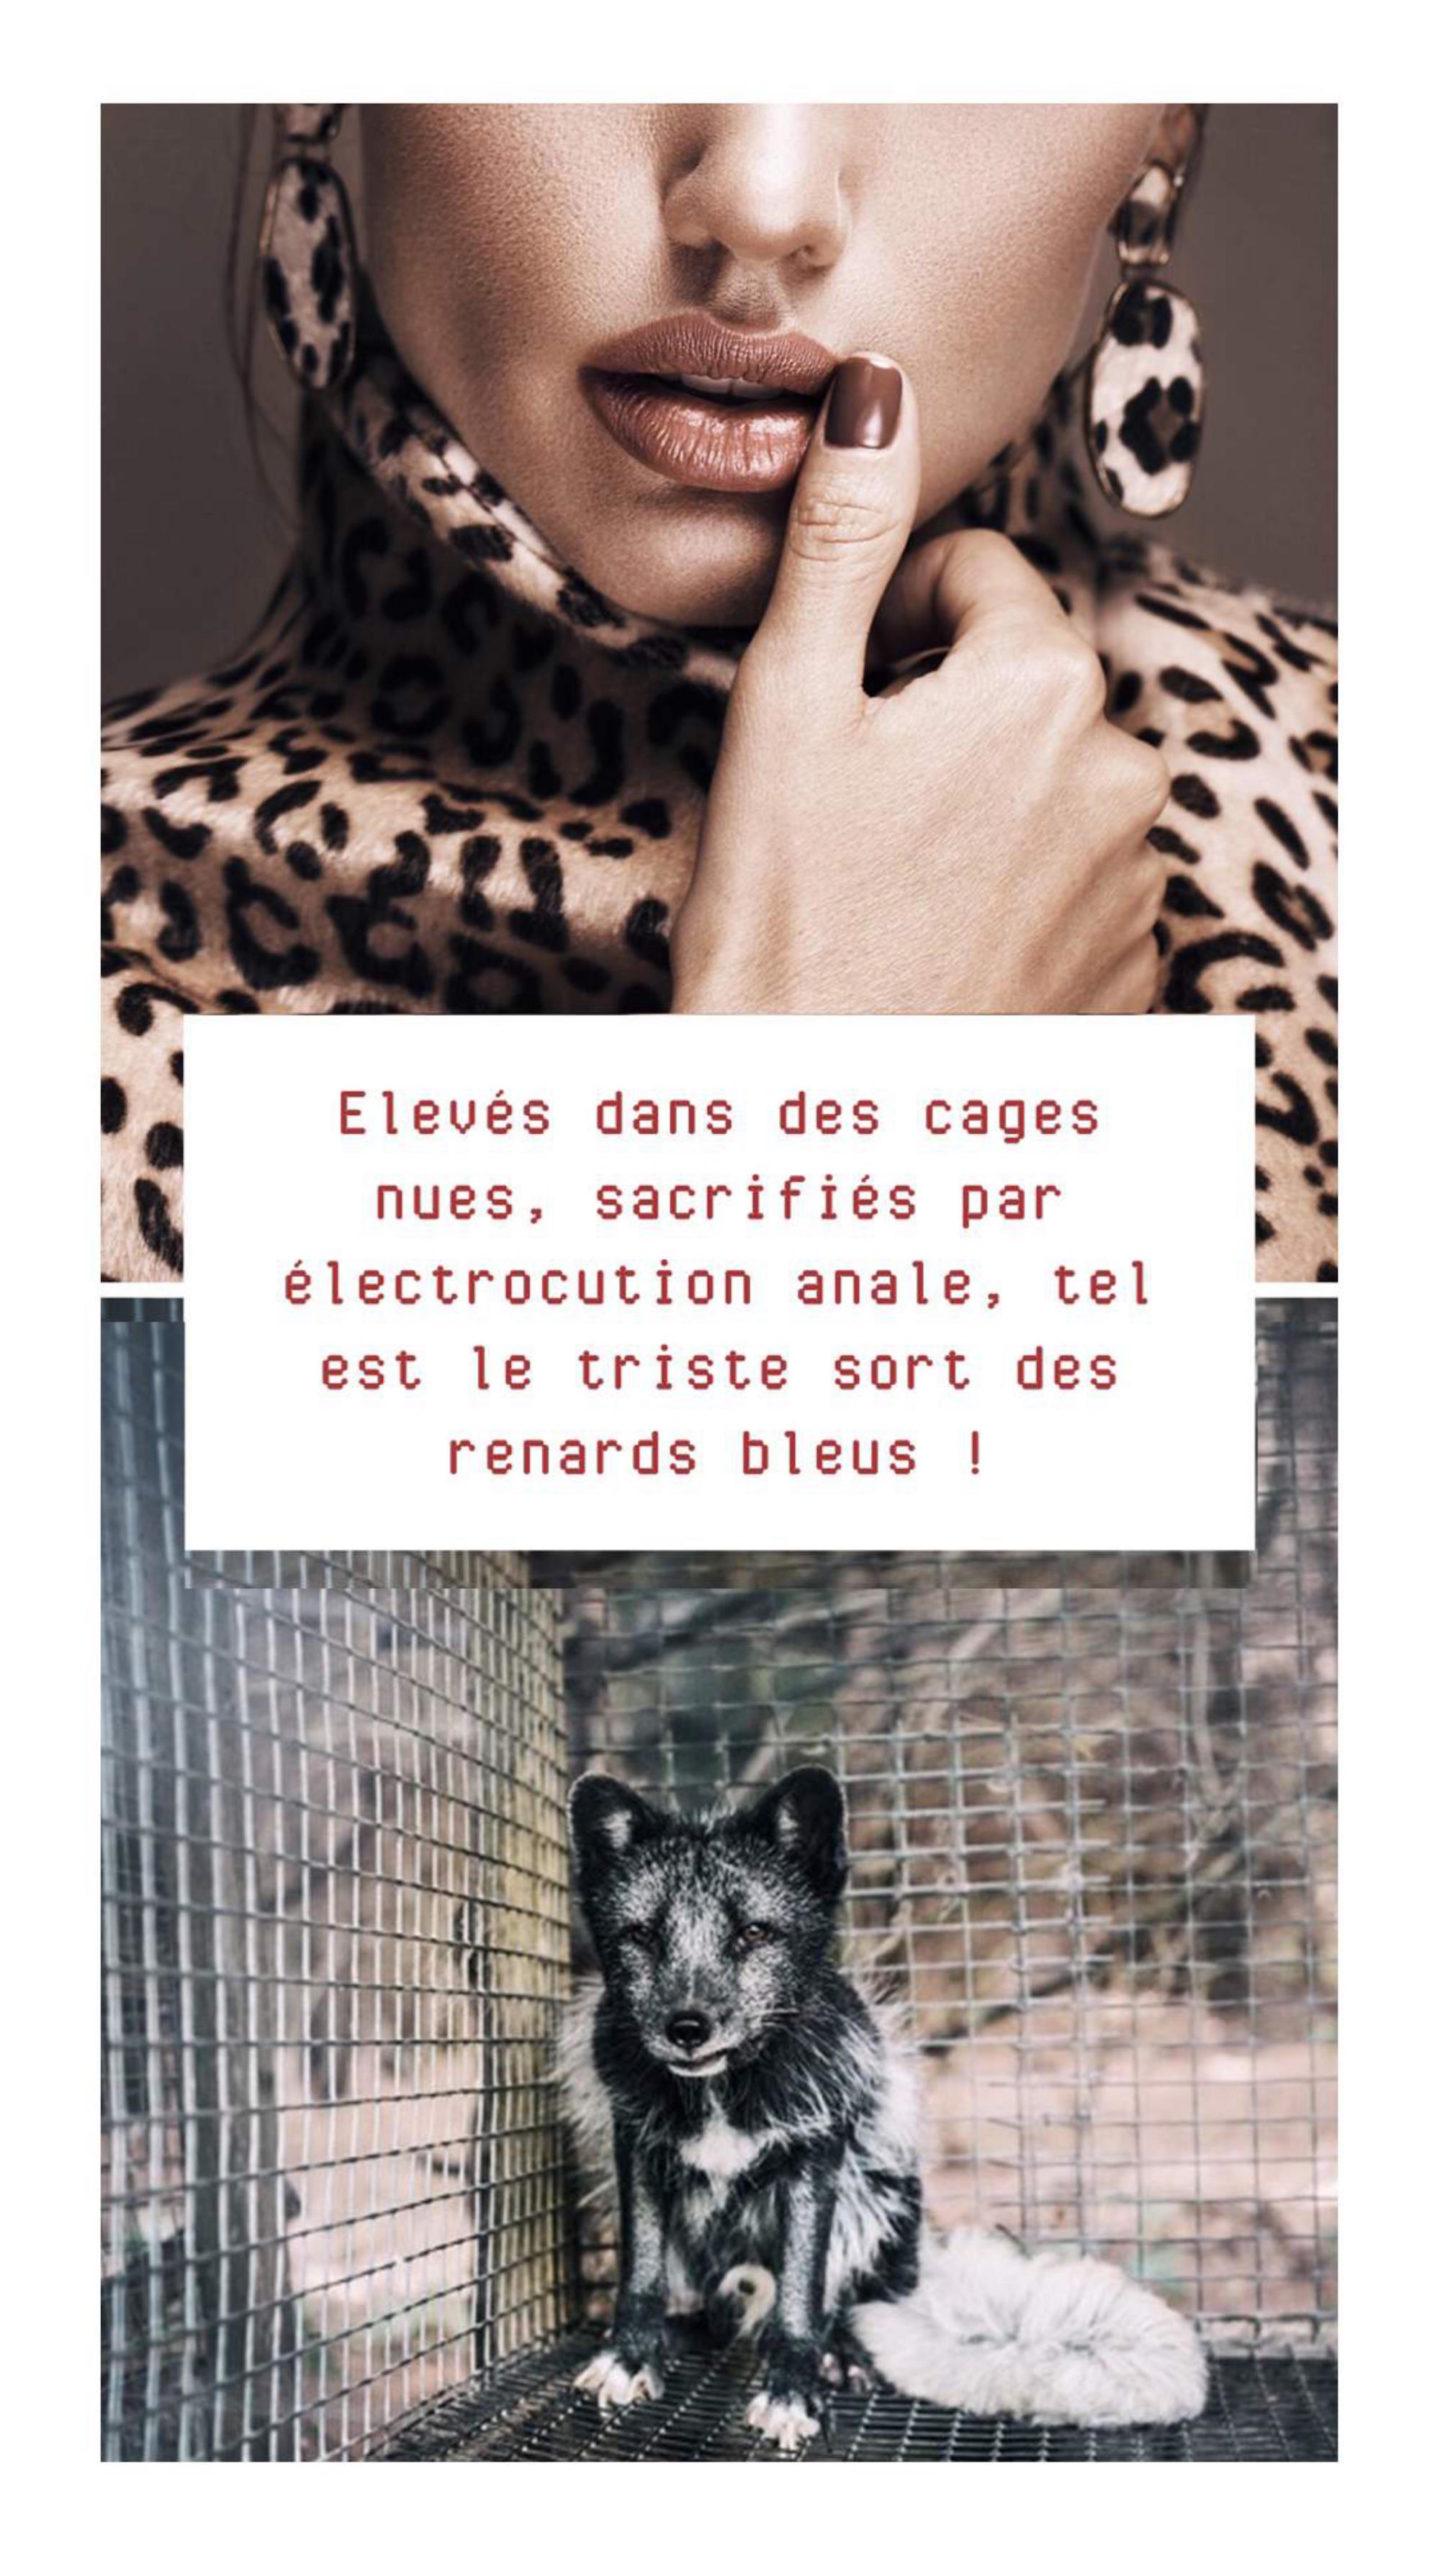 CATALOGUE-CAMPAGNE-ANTI-FOURRURE-page-7